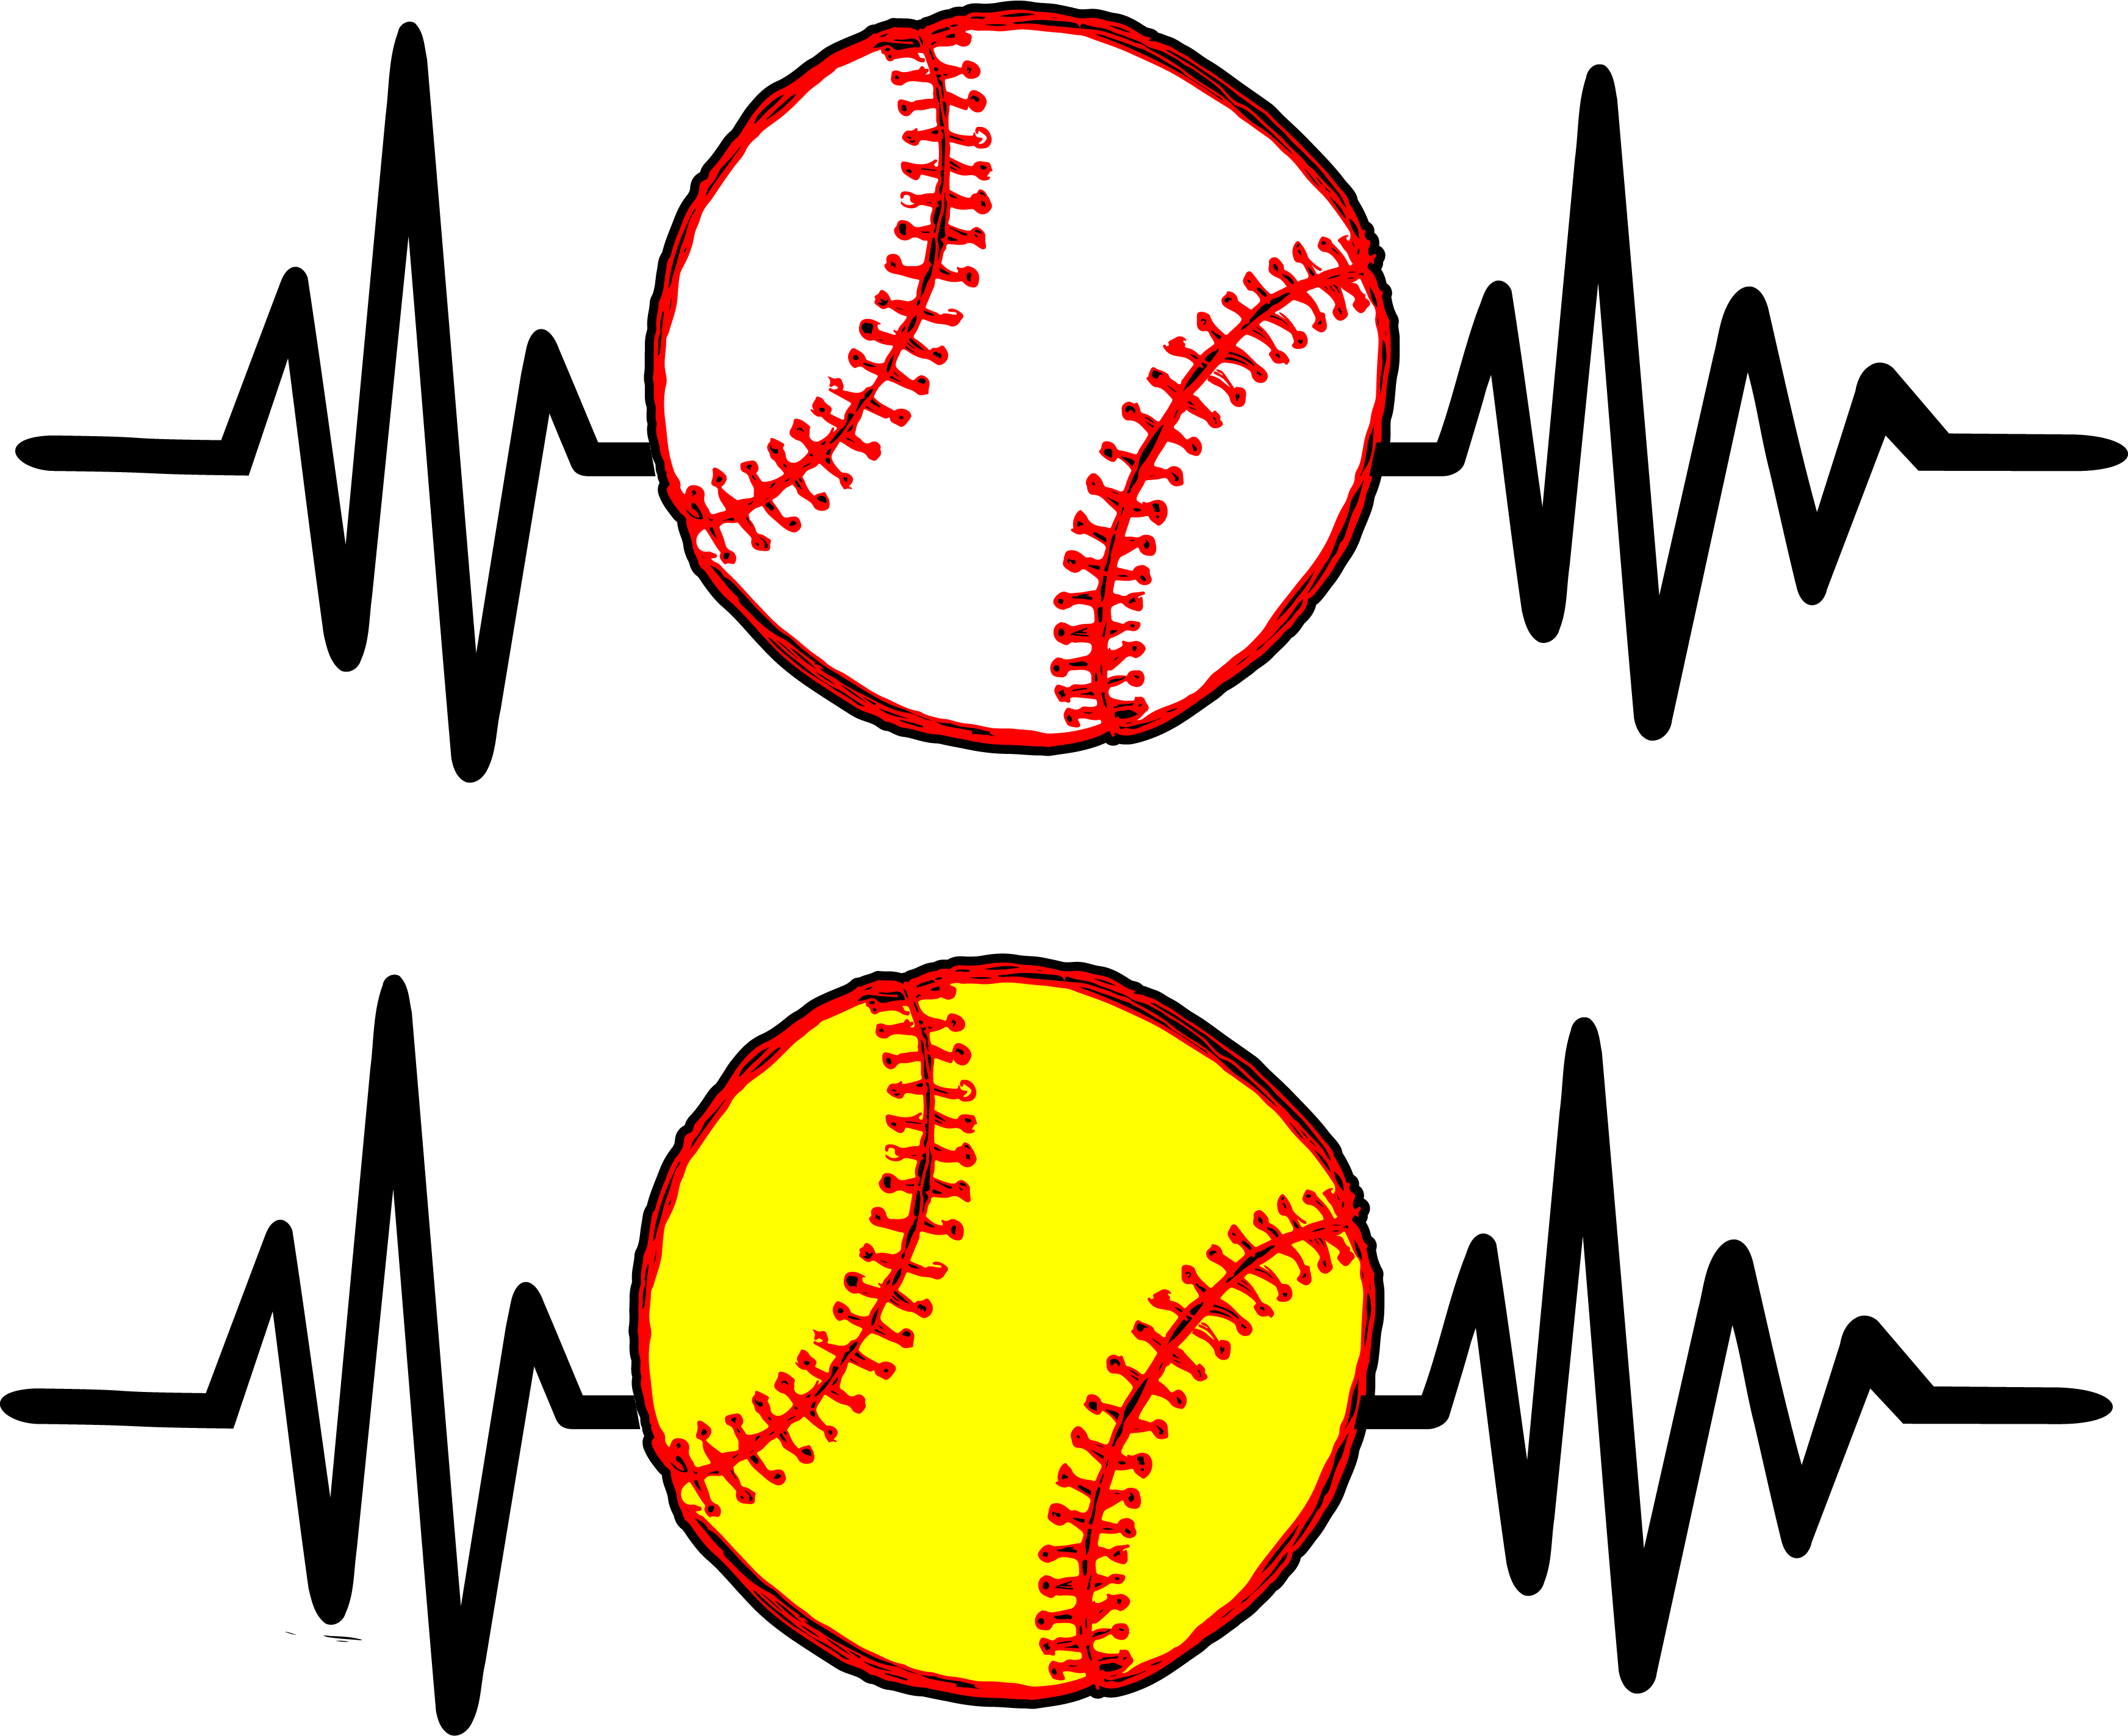 Heartbeat clipart softball. Baseball printed transfers sew